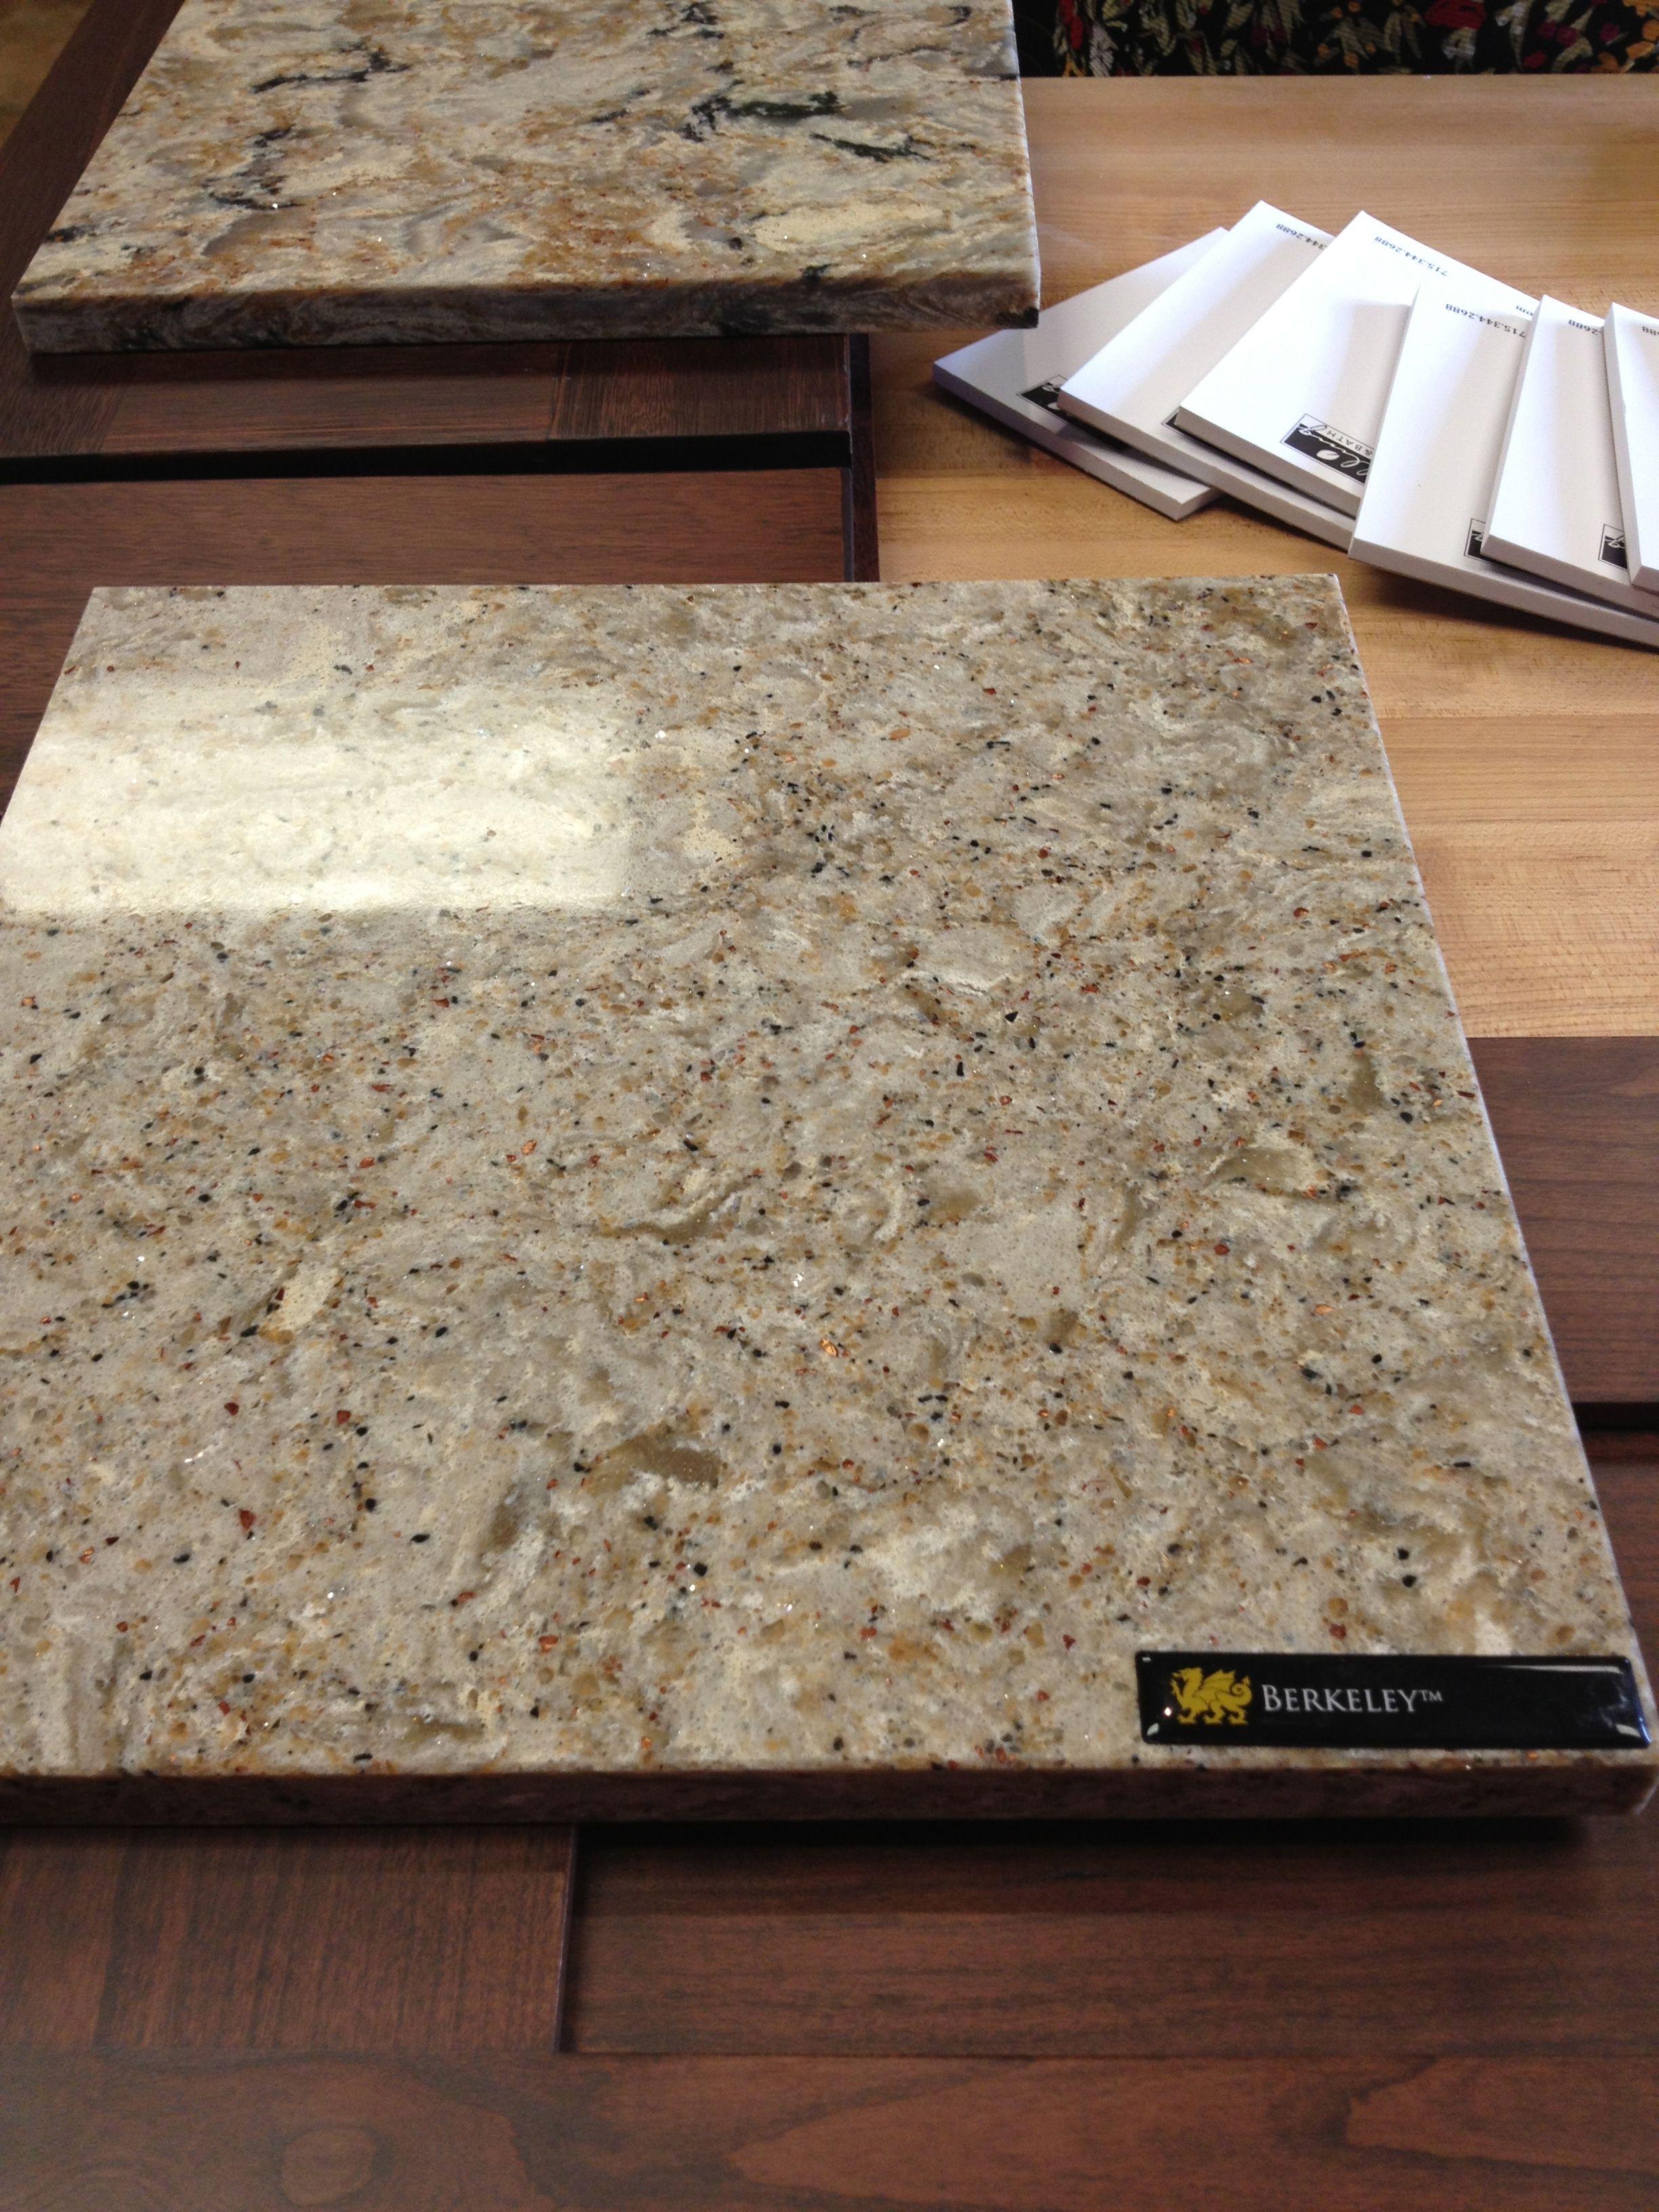 cambria berkeley quartz countertop for master bathroom kitch